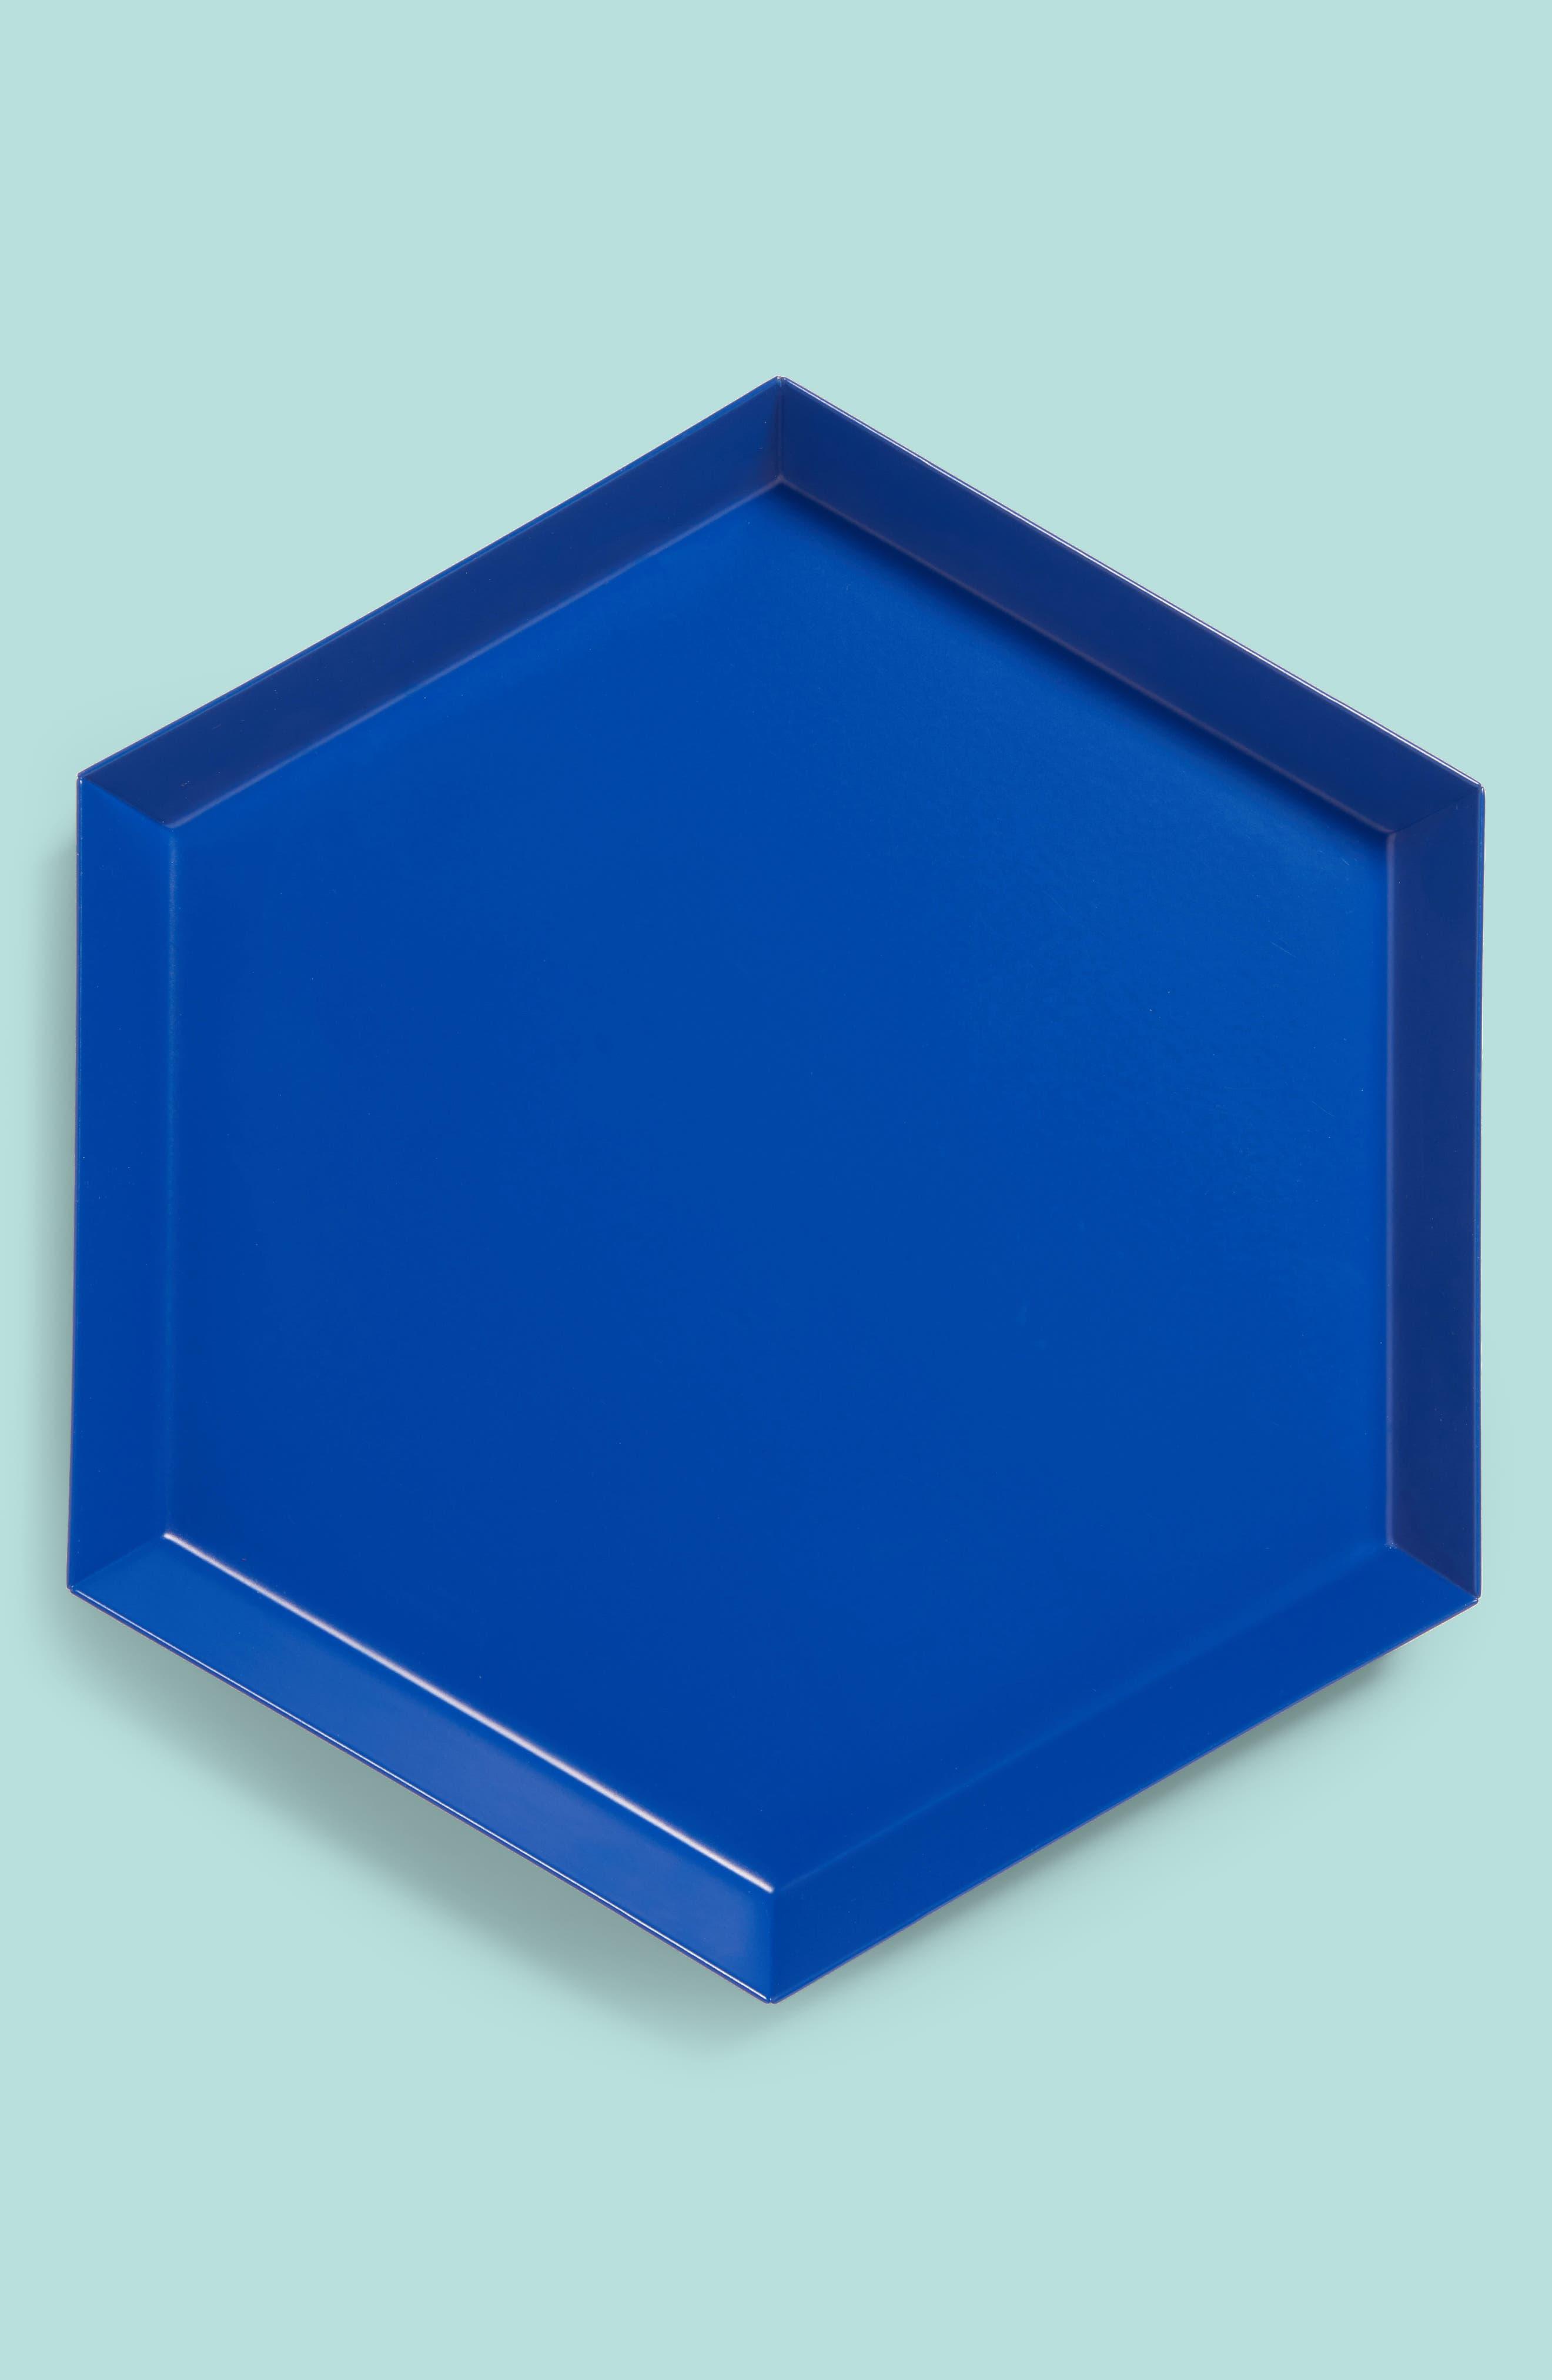 Small Kaleido Powder Coated Steel Tray,                             Main thumbnail 1, color,                             Royal Blue